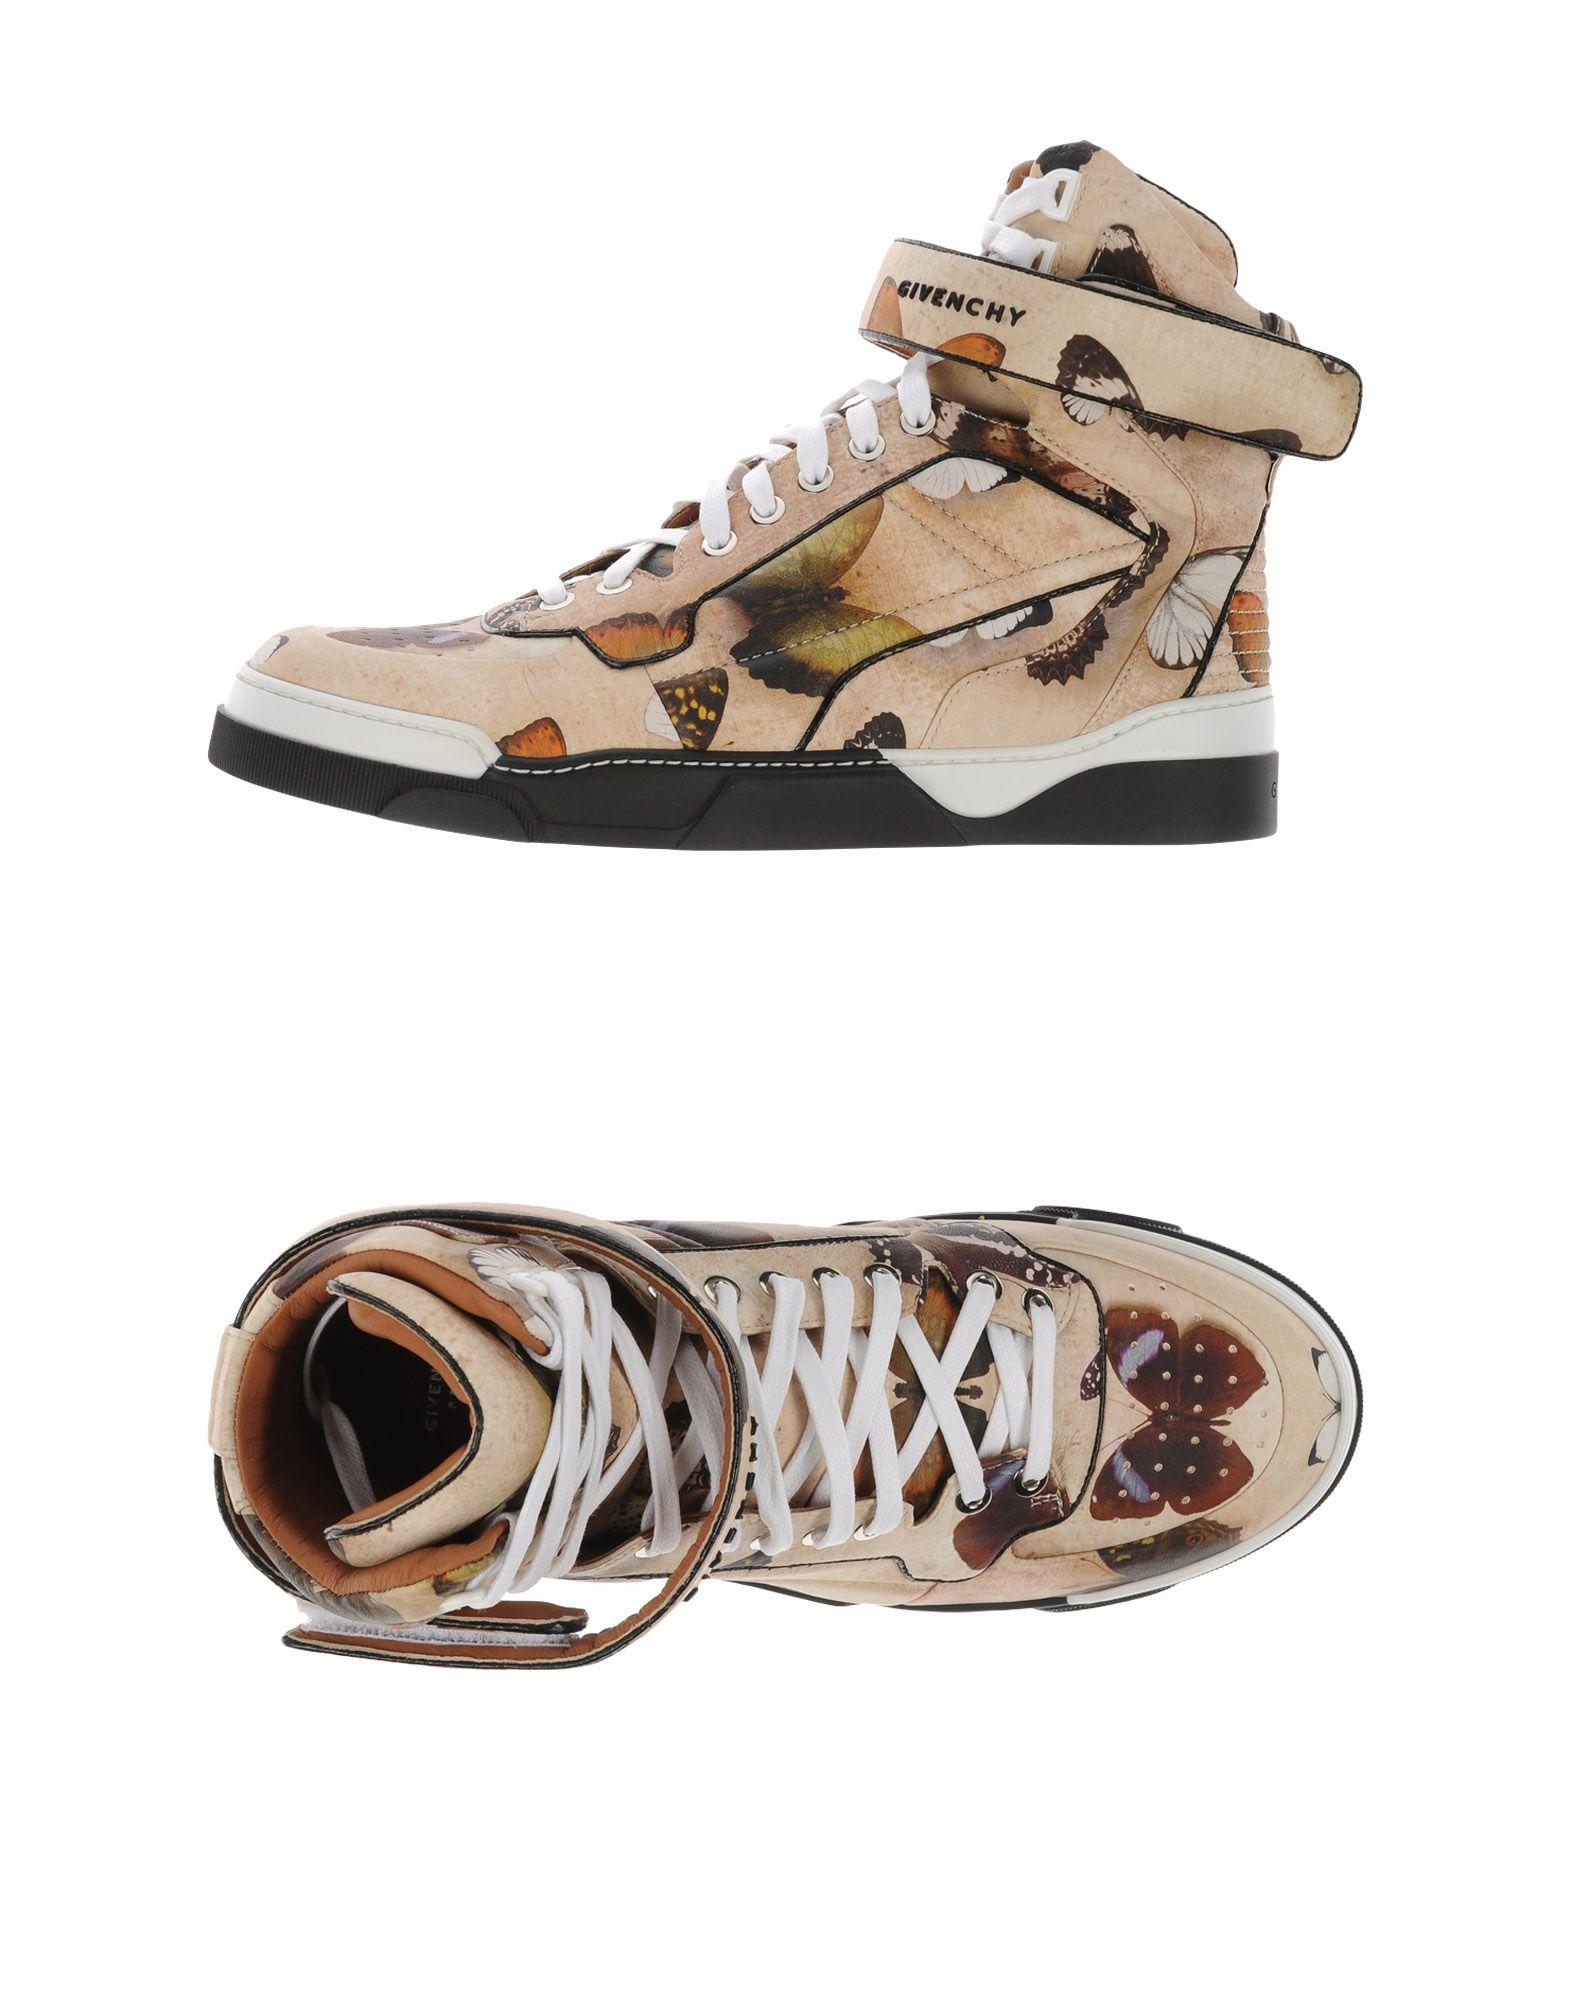 Givenchy Sneakers - Women Women Women Givenchy Sneakers online on  Canada - 44929207DG 34b9e9